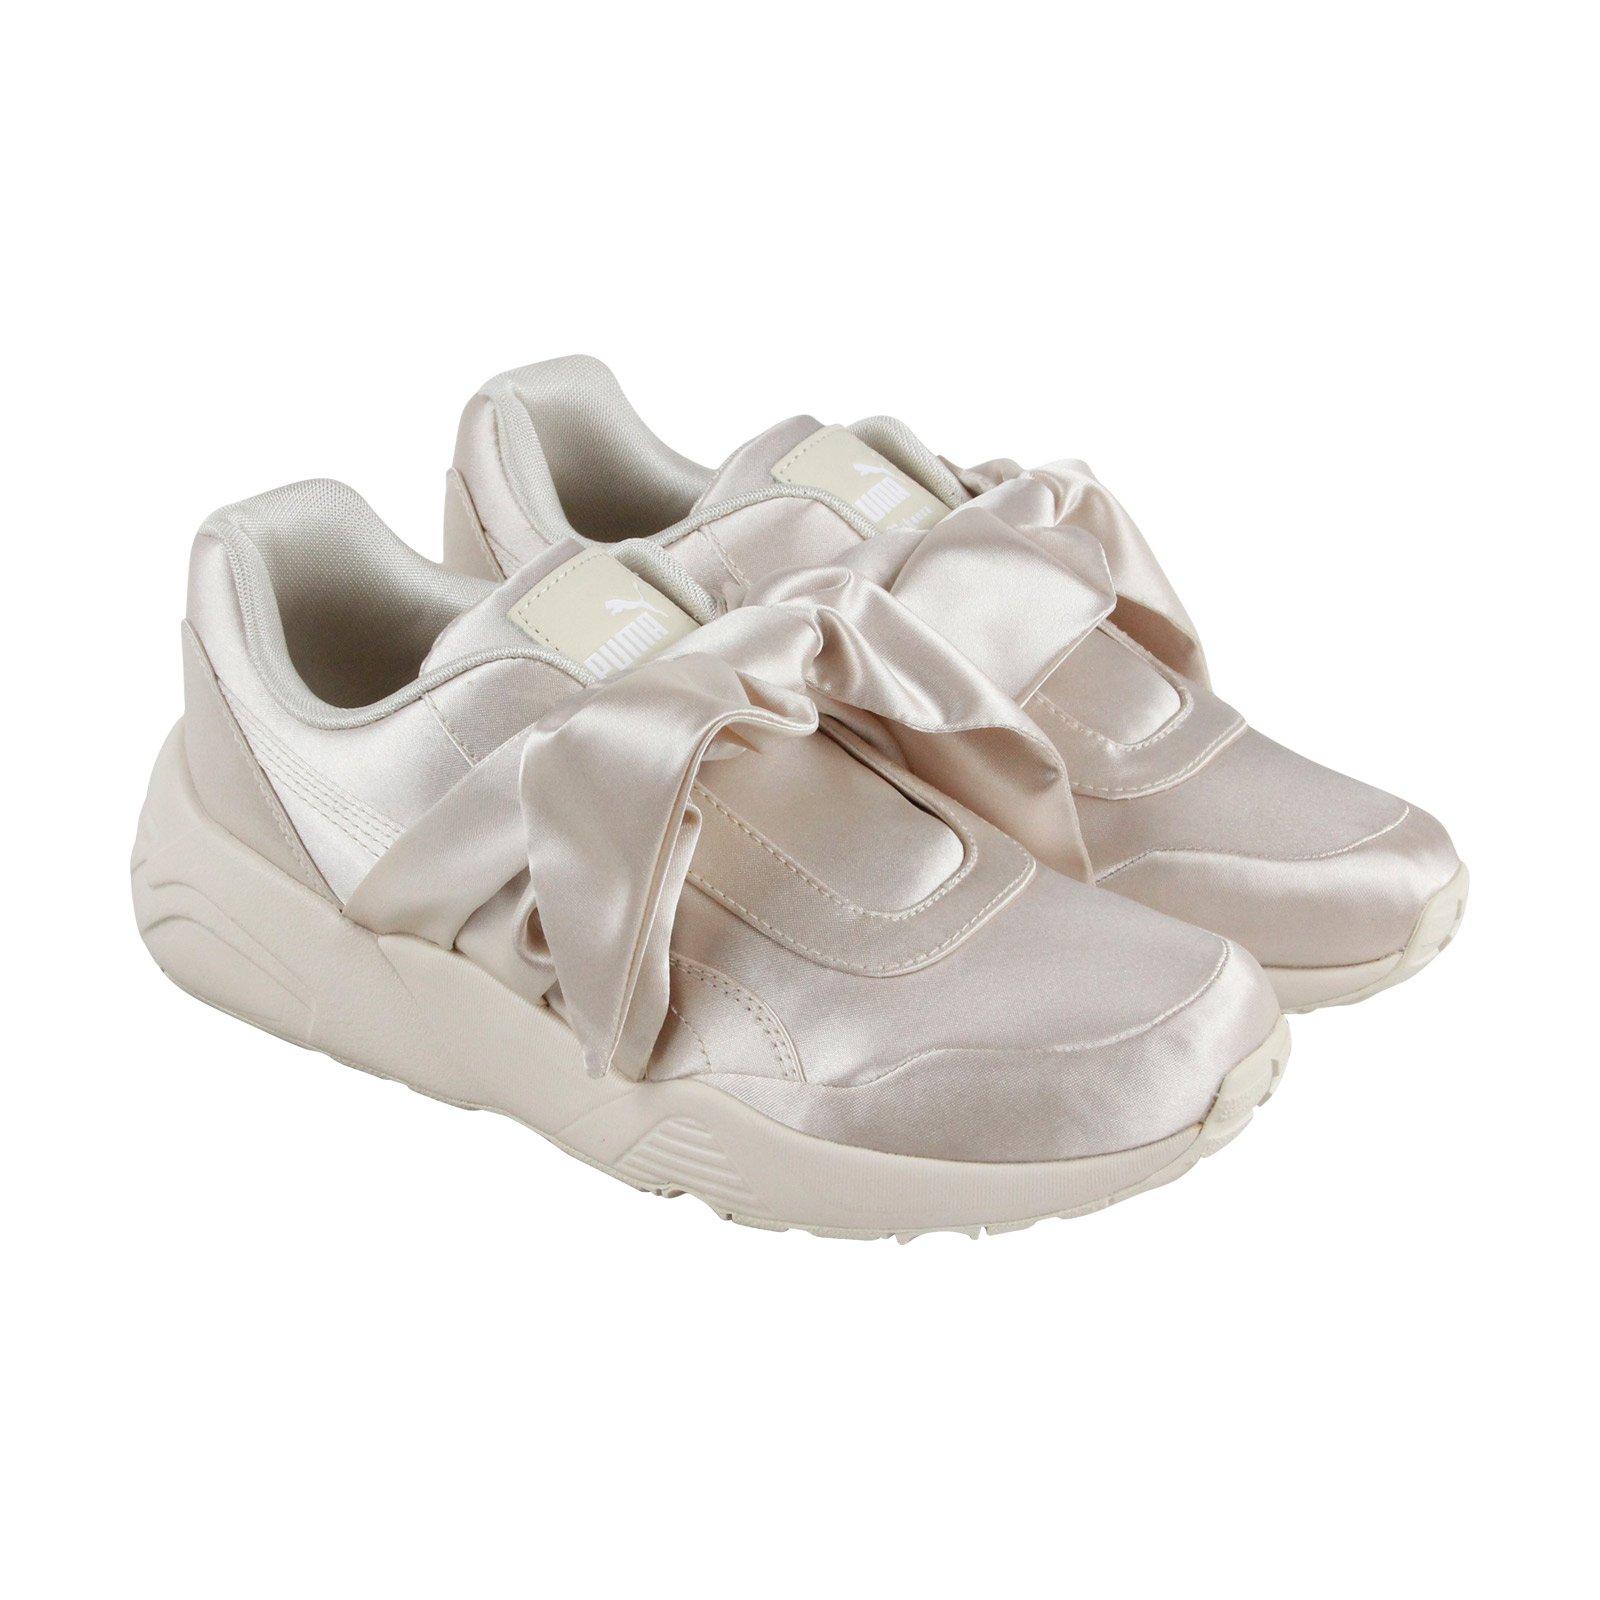 8beba9887c6e Galleon - PUMA Womens Fenty By Rihanna RiRi Pink Bow Sneaker 36505402  Sneakers Shoes 9.5